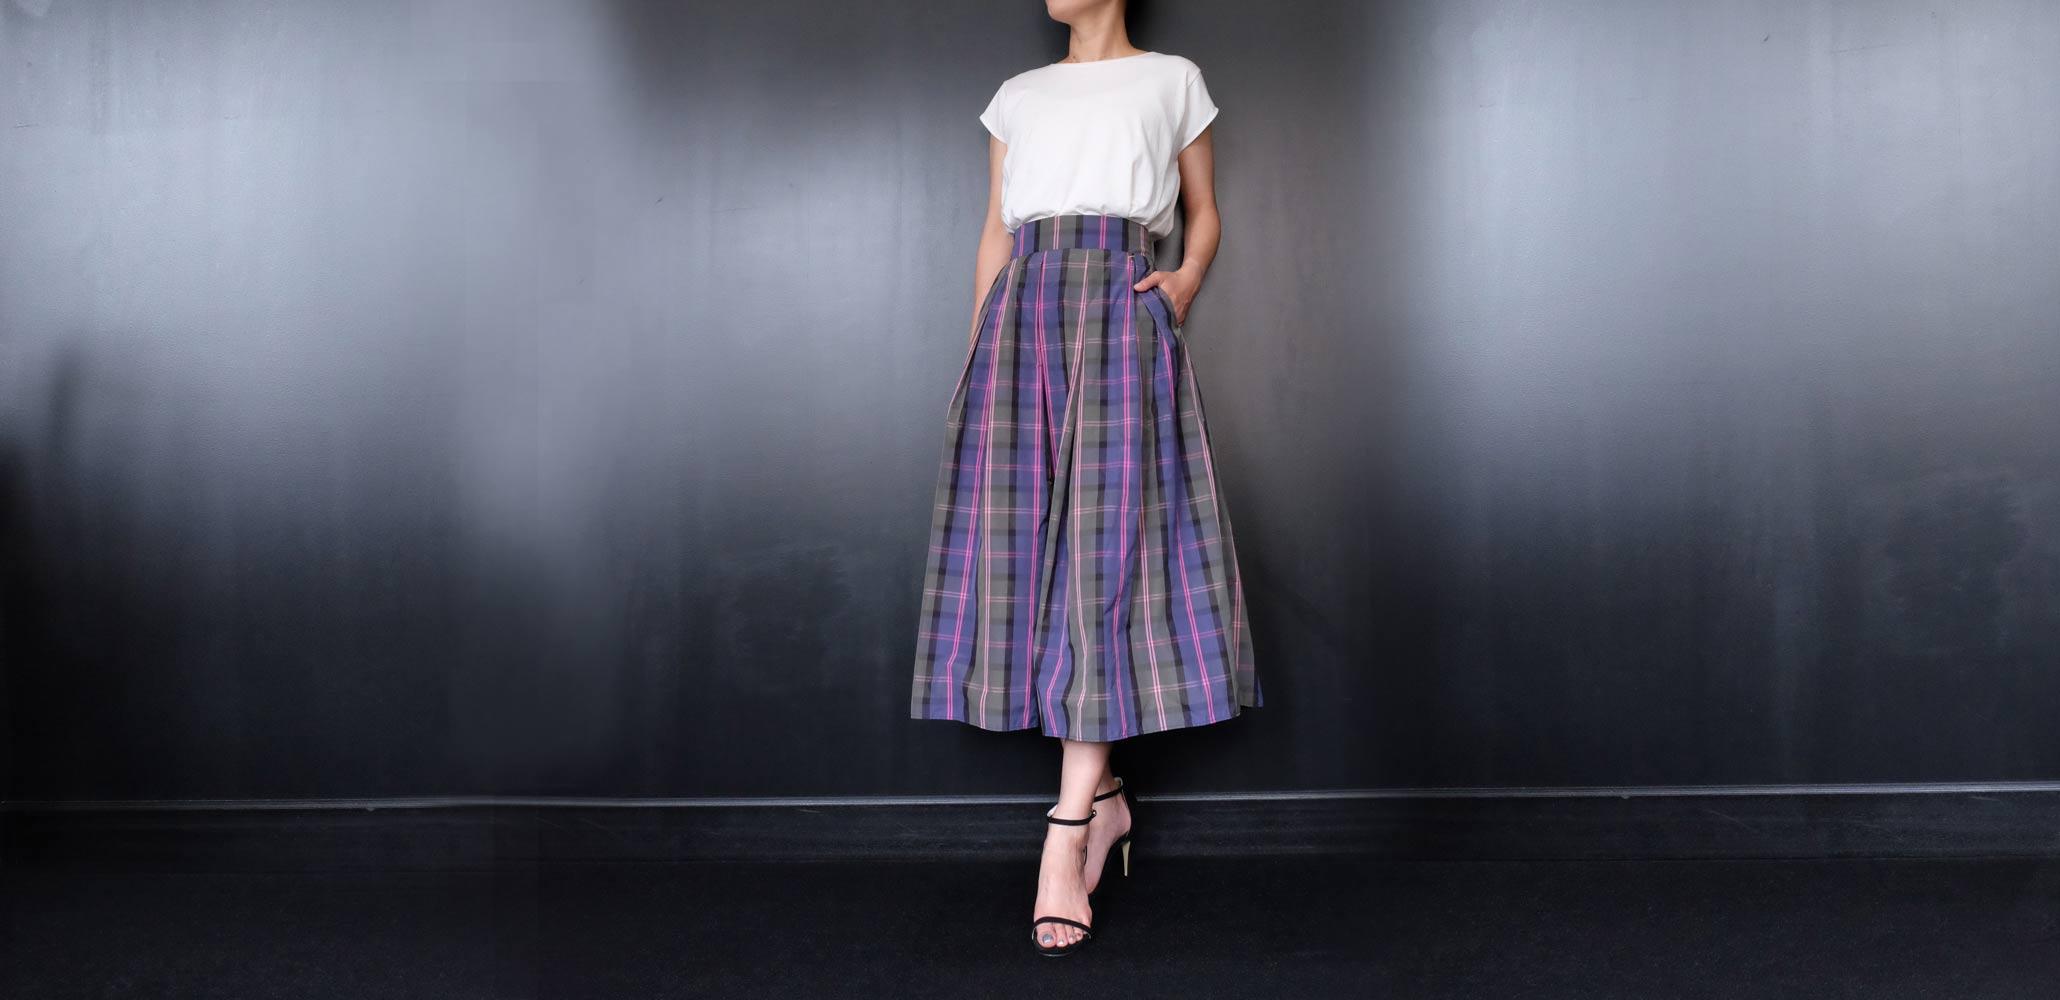 TRECODE人気商品のチェック柄スカート